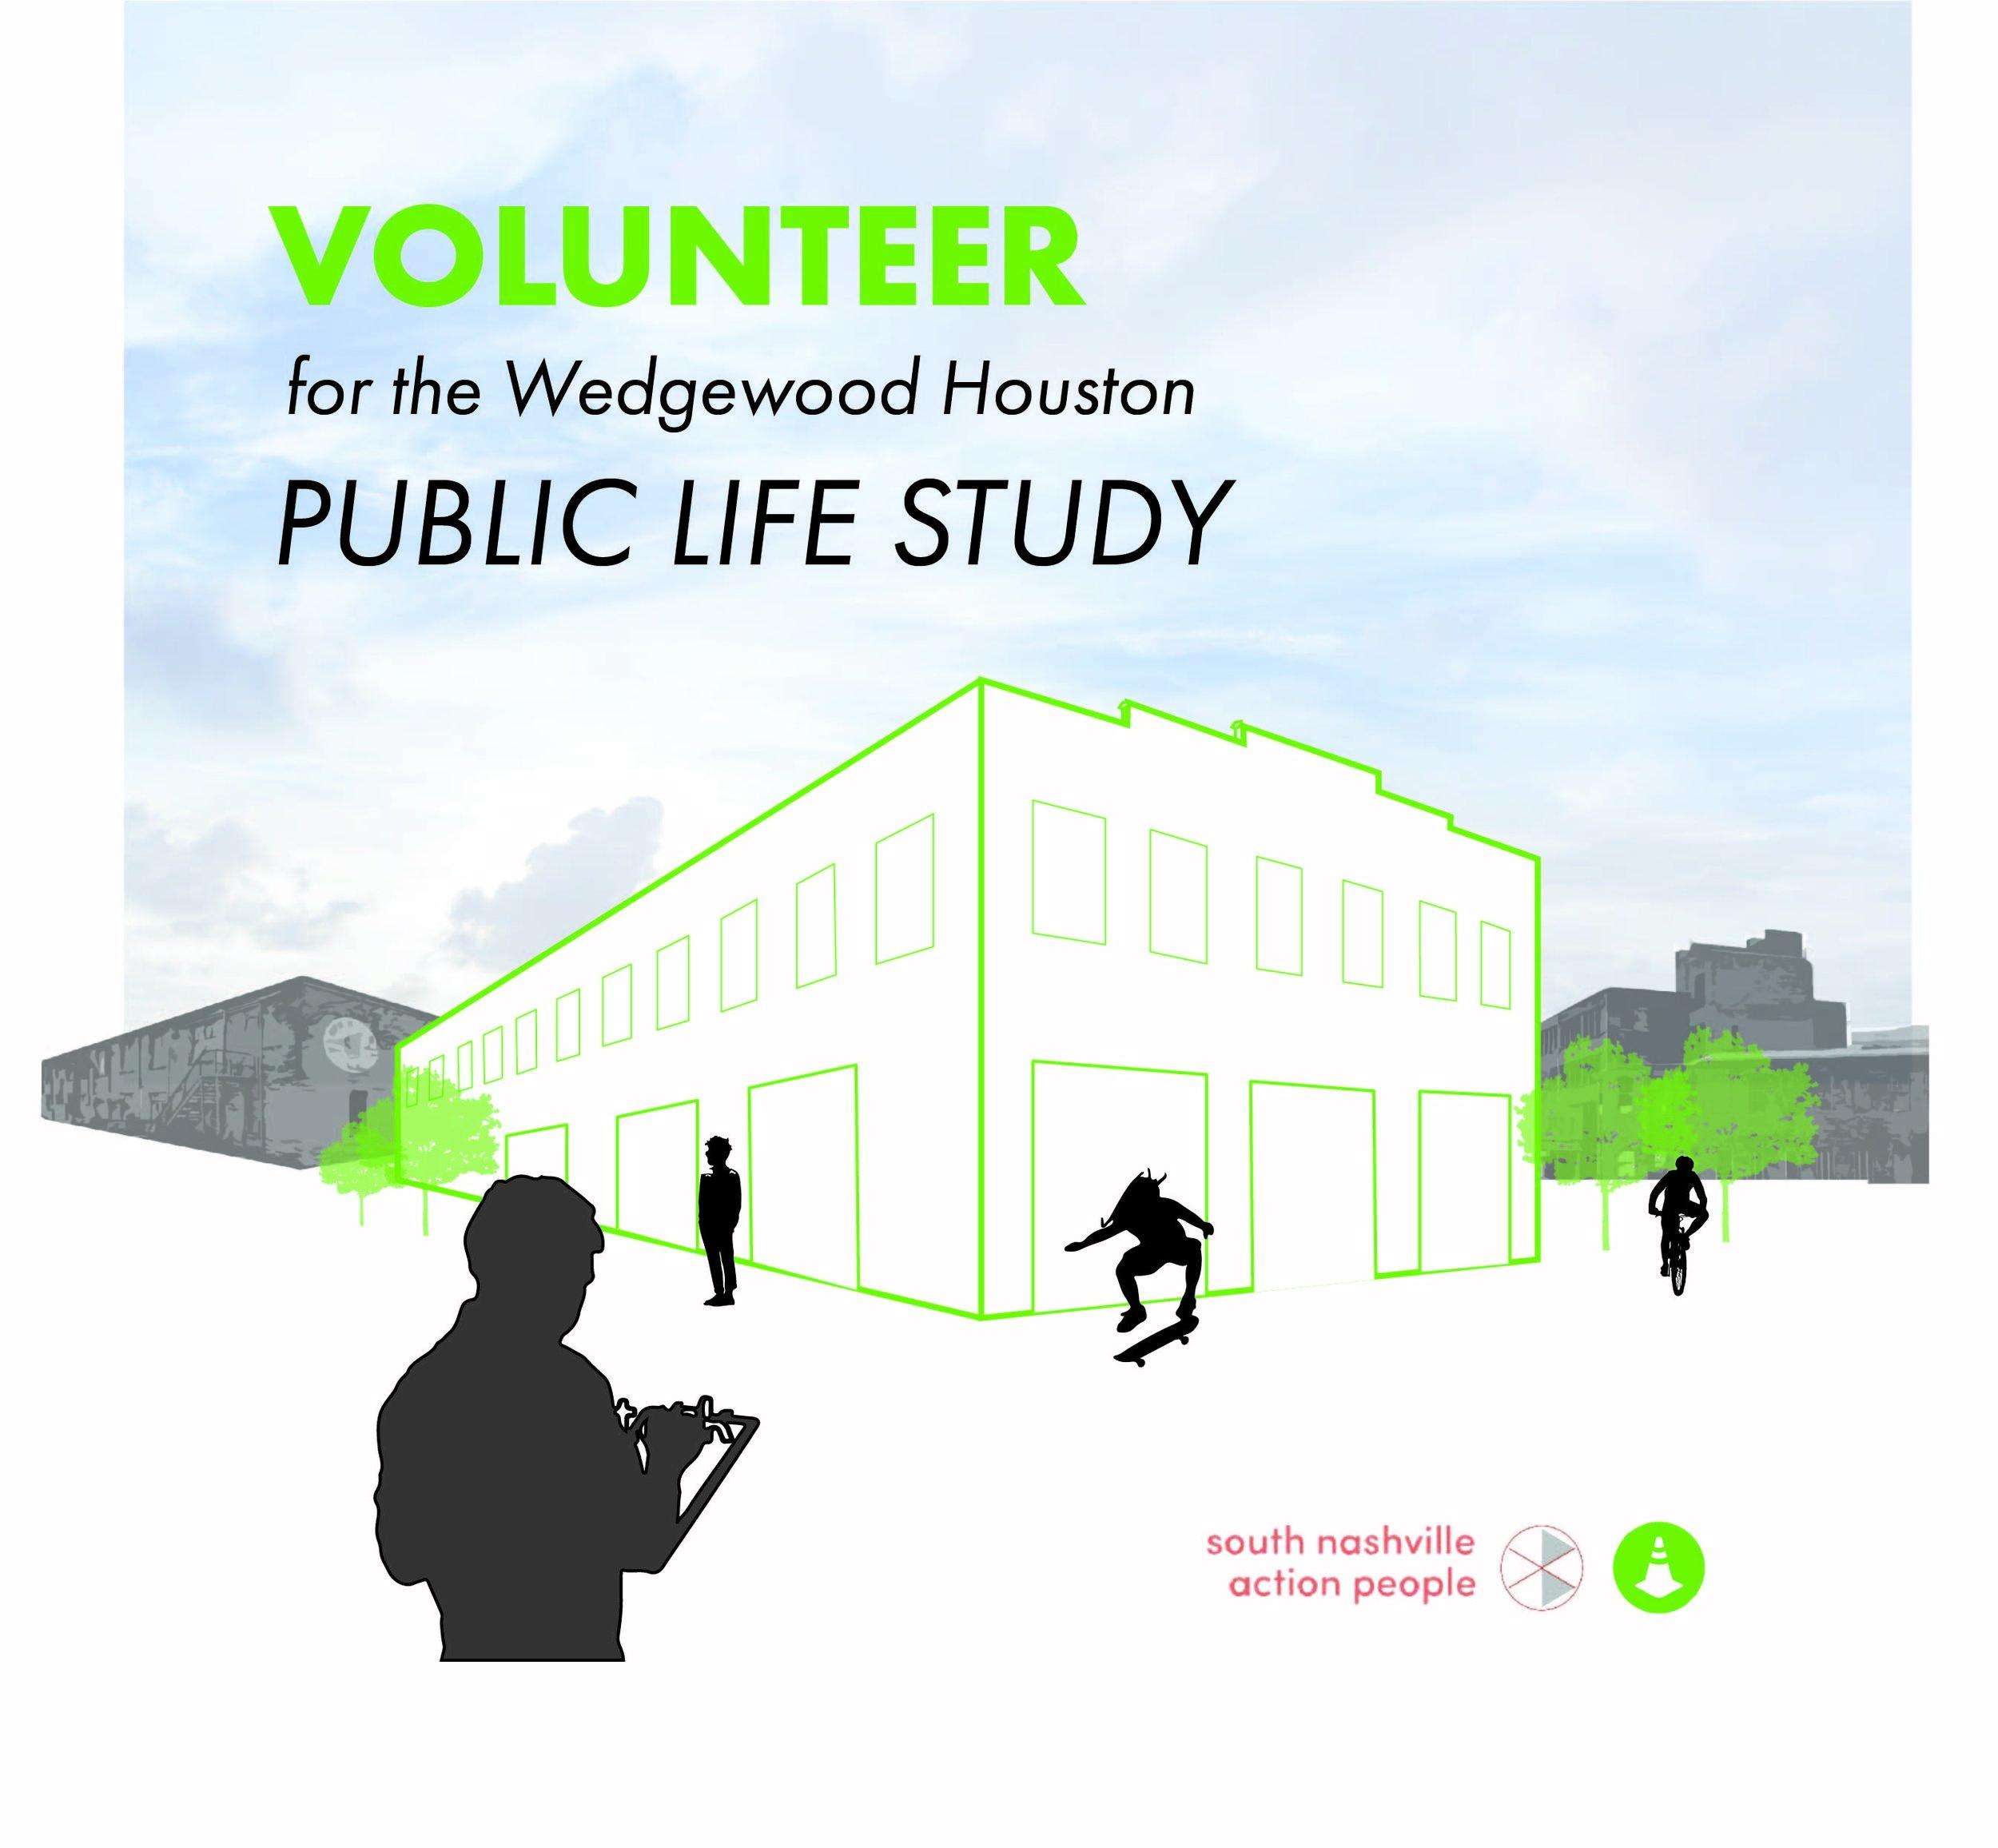 public_life_study_300dpi.jpg